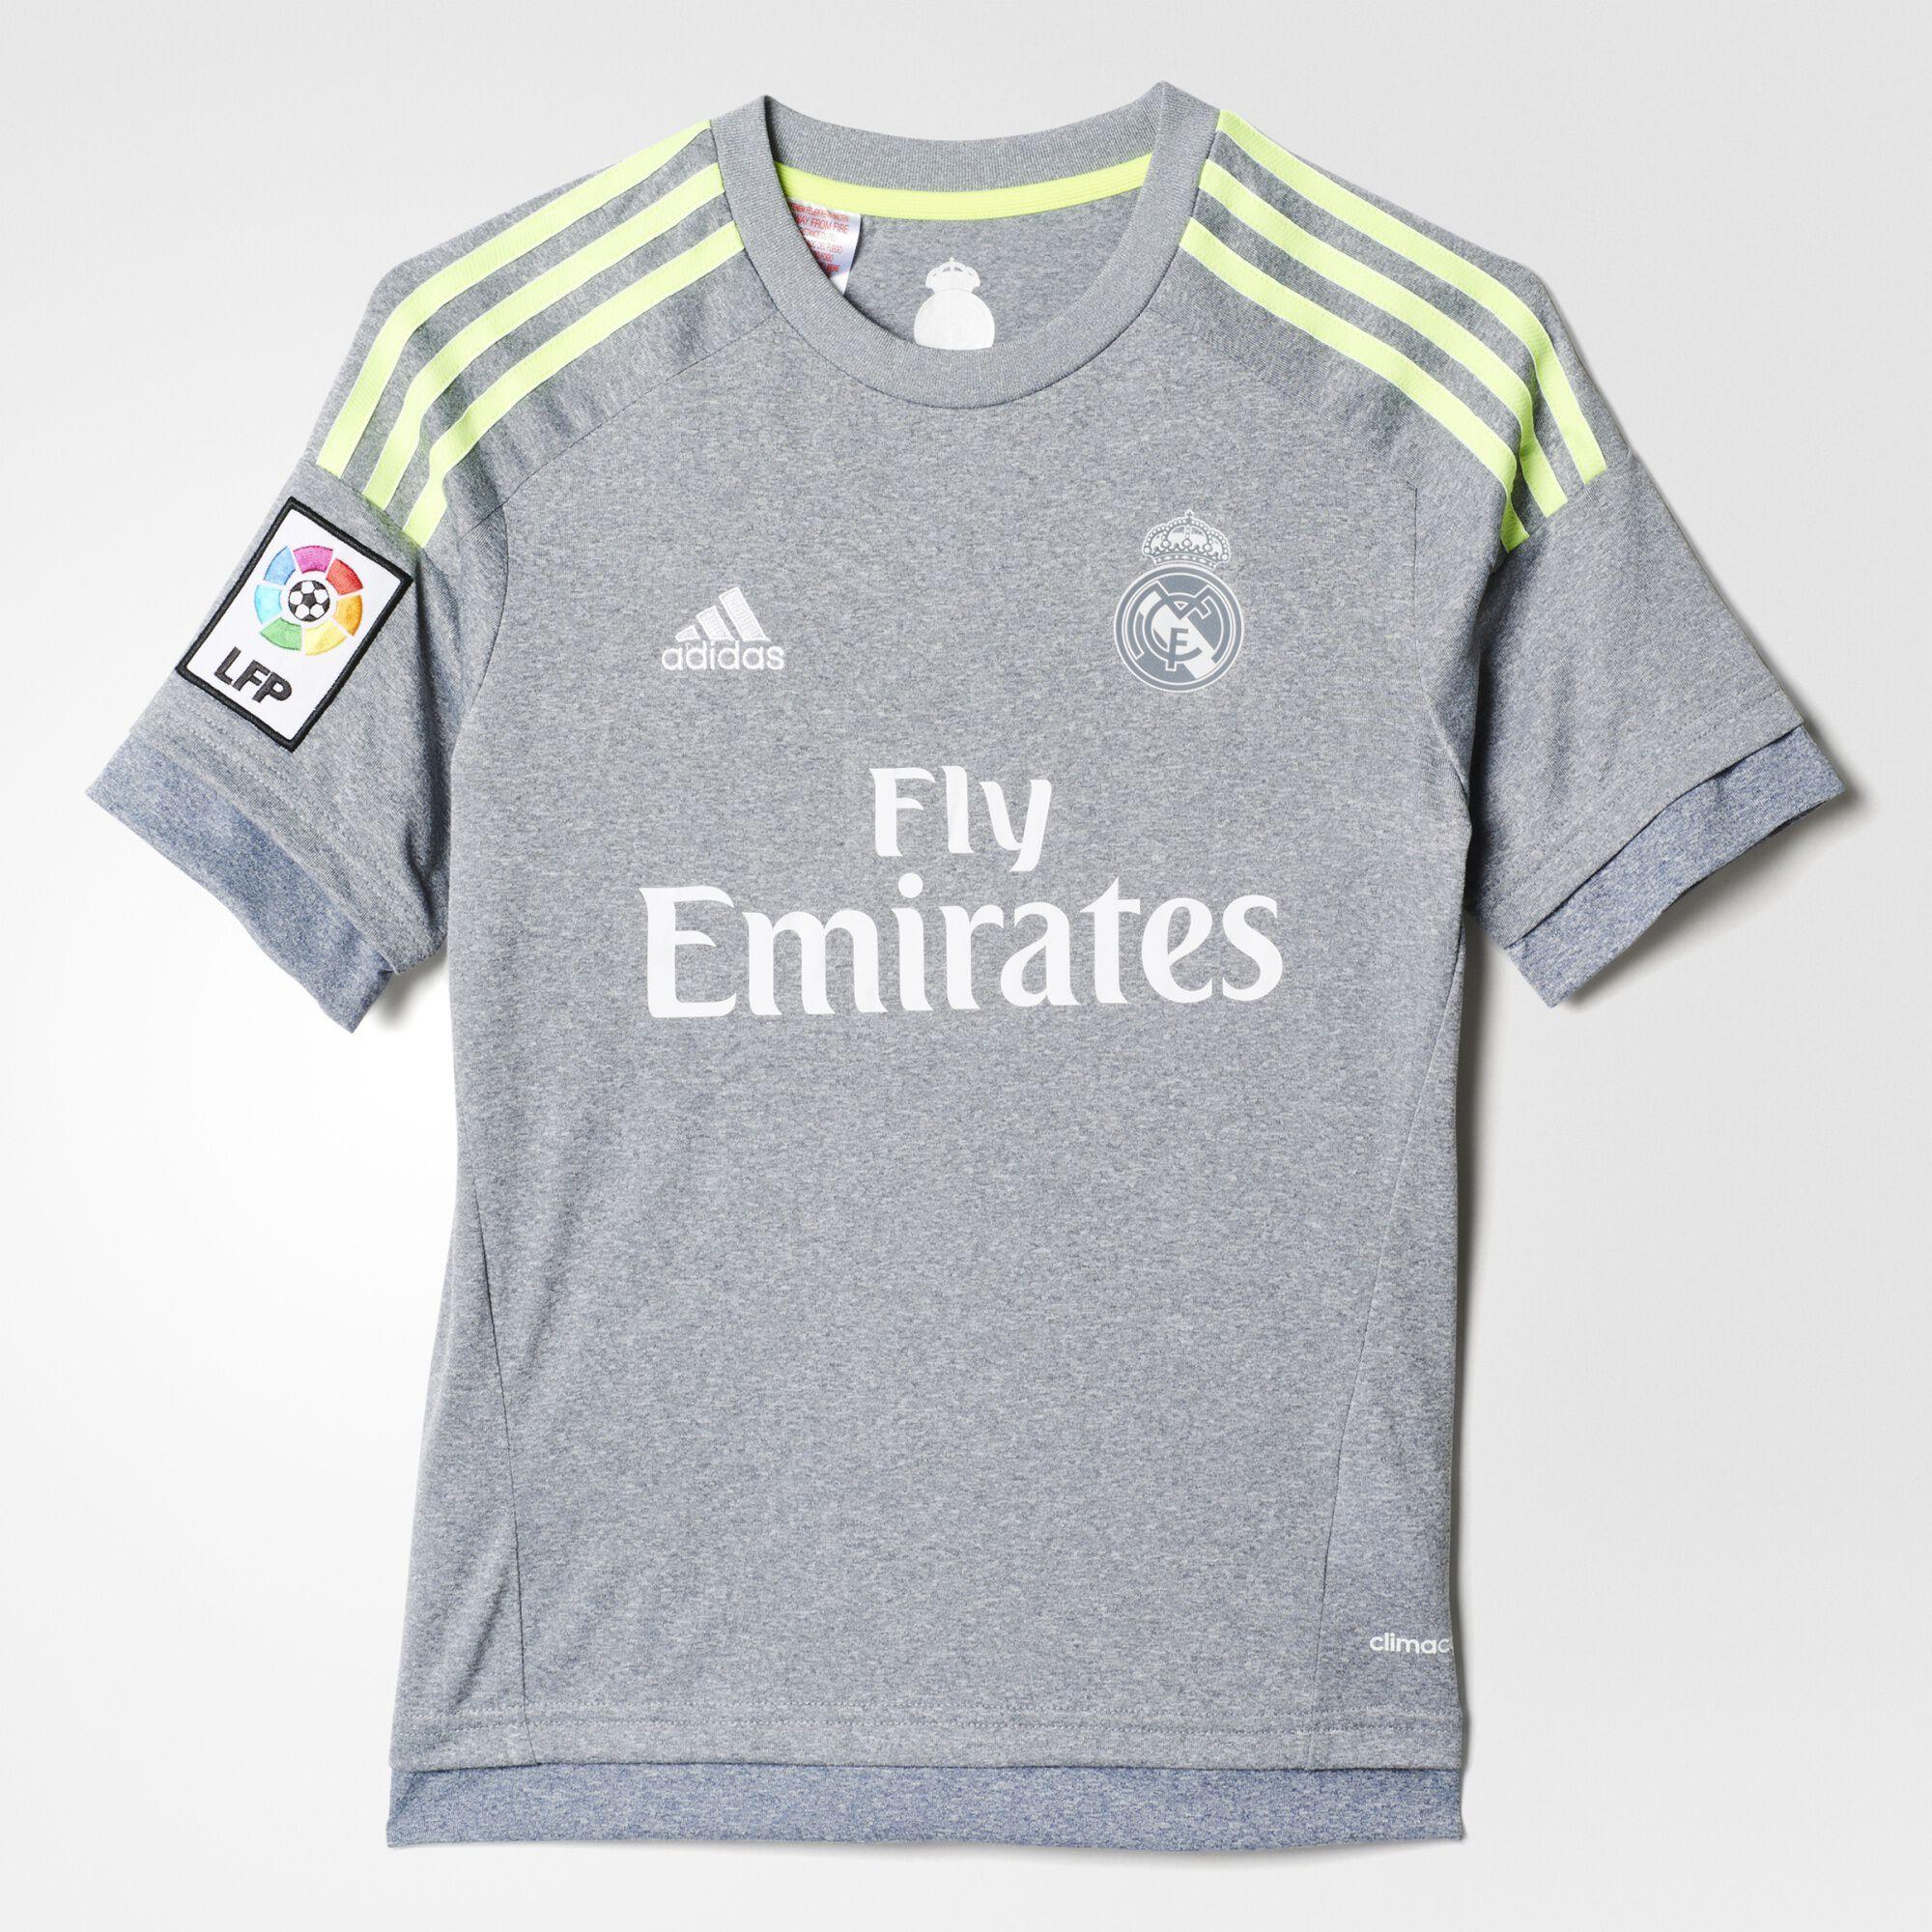 adidas Enfants Real Madrid Away Replica Jersey - Grey . 89741095c